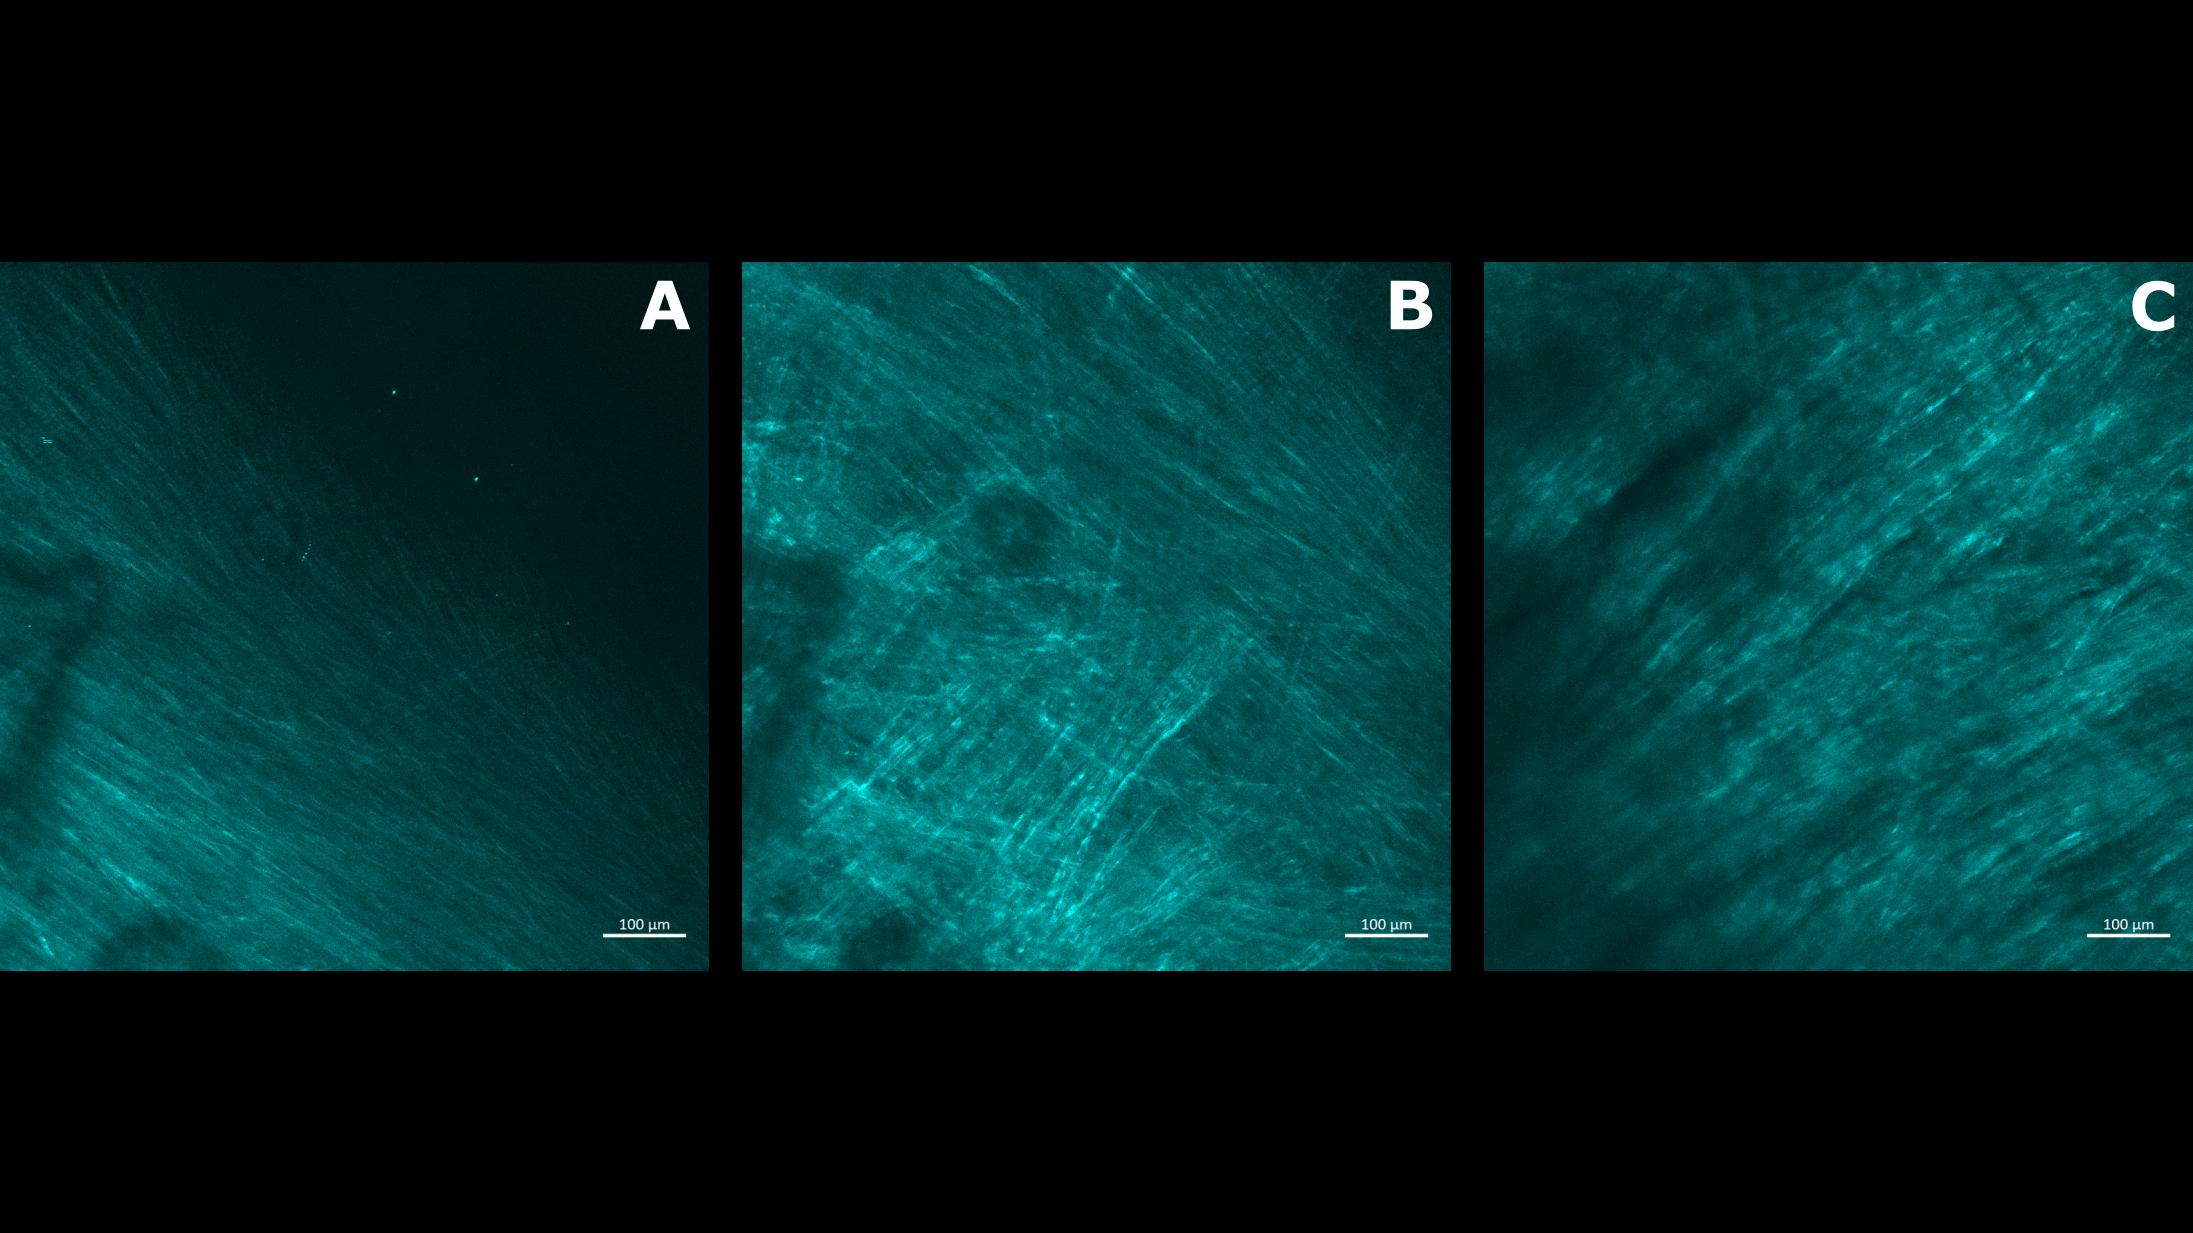 Collagen imaging